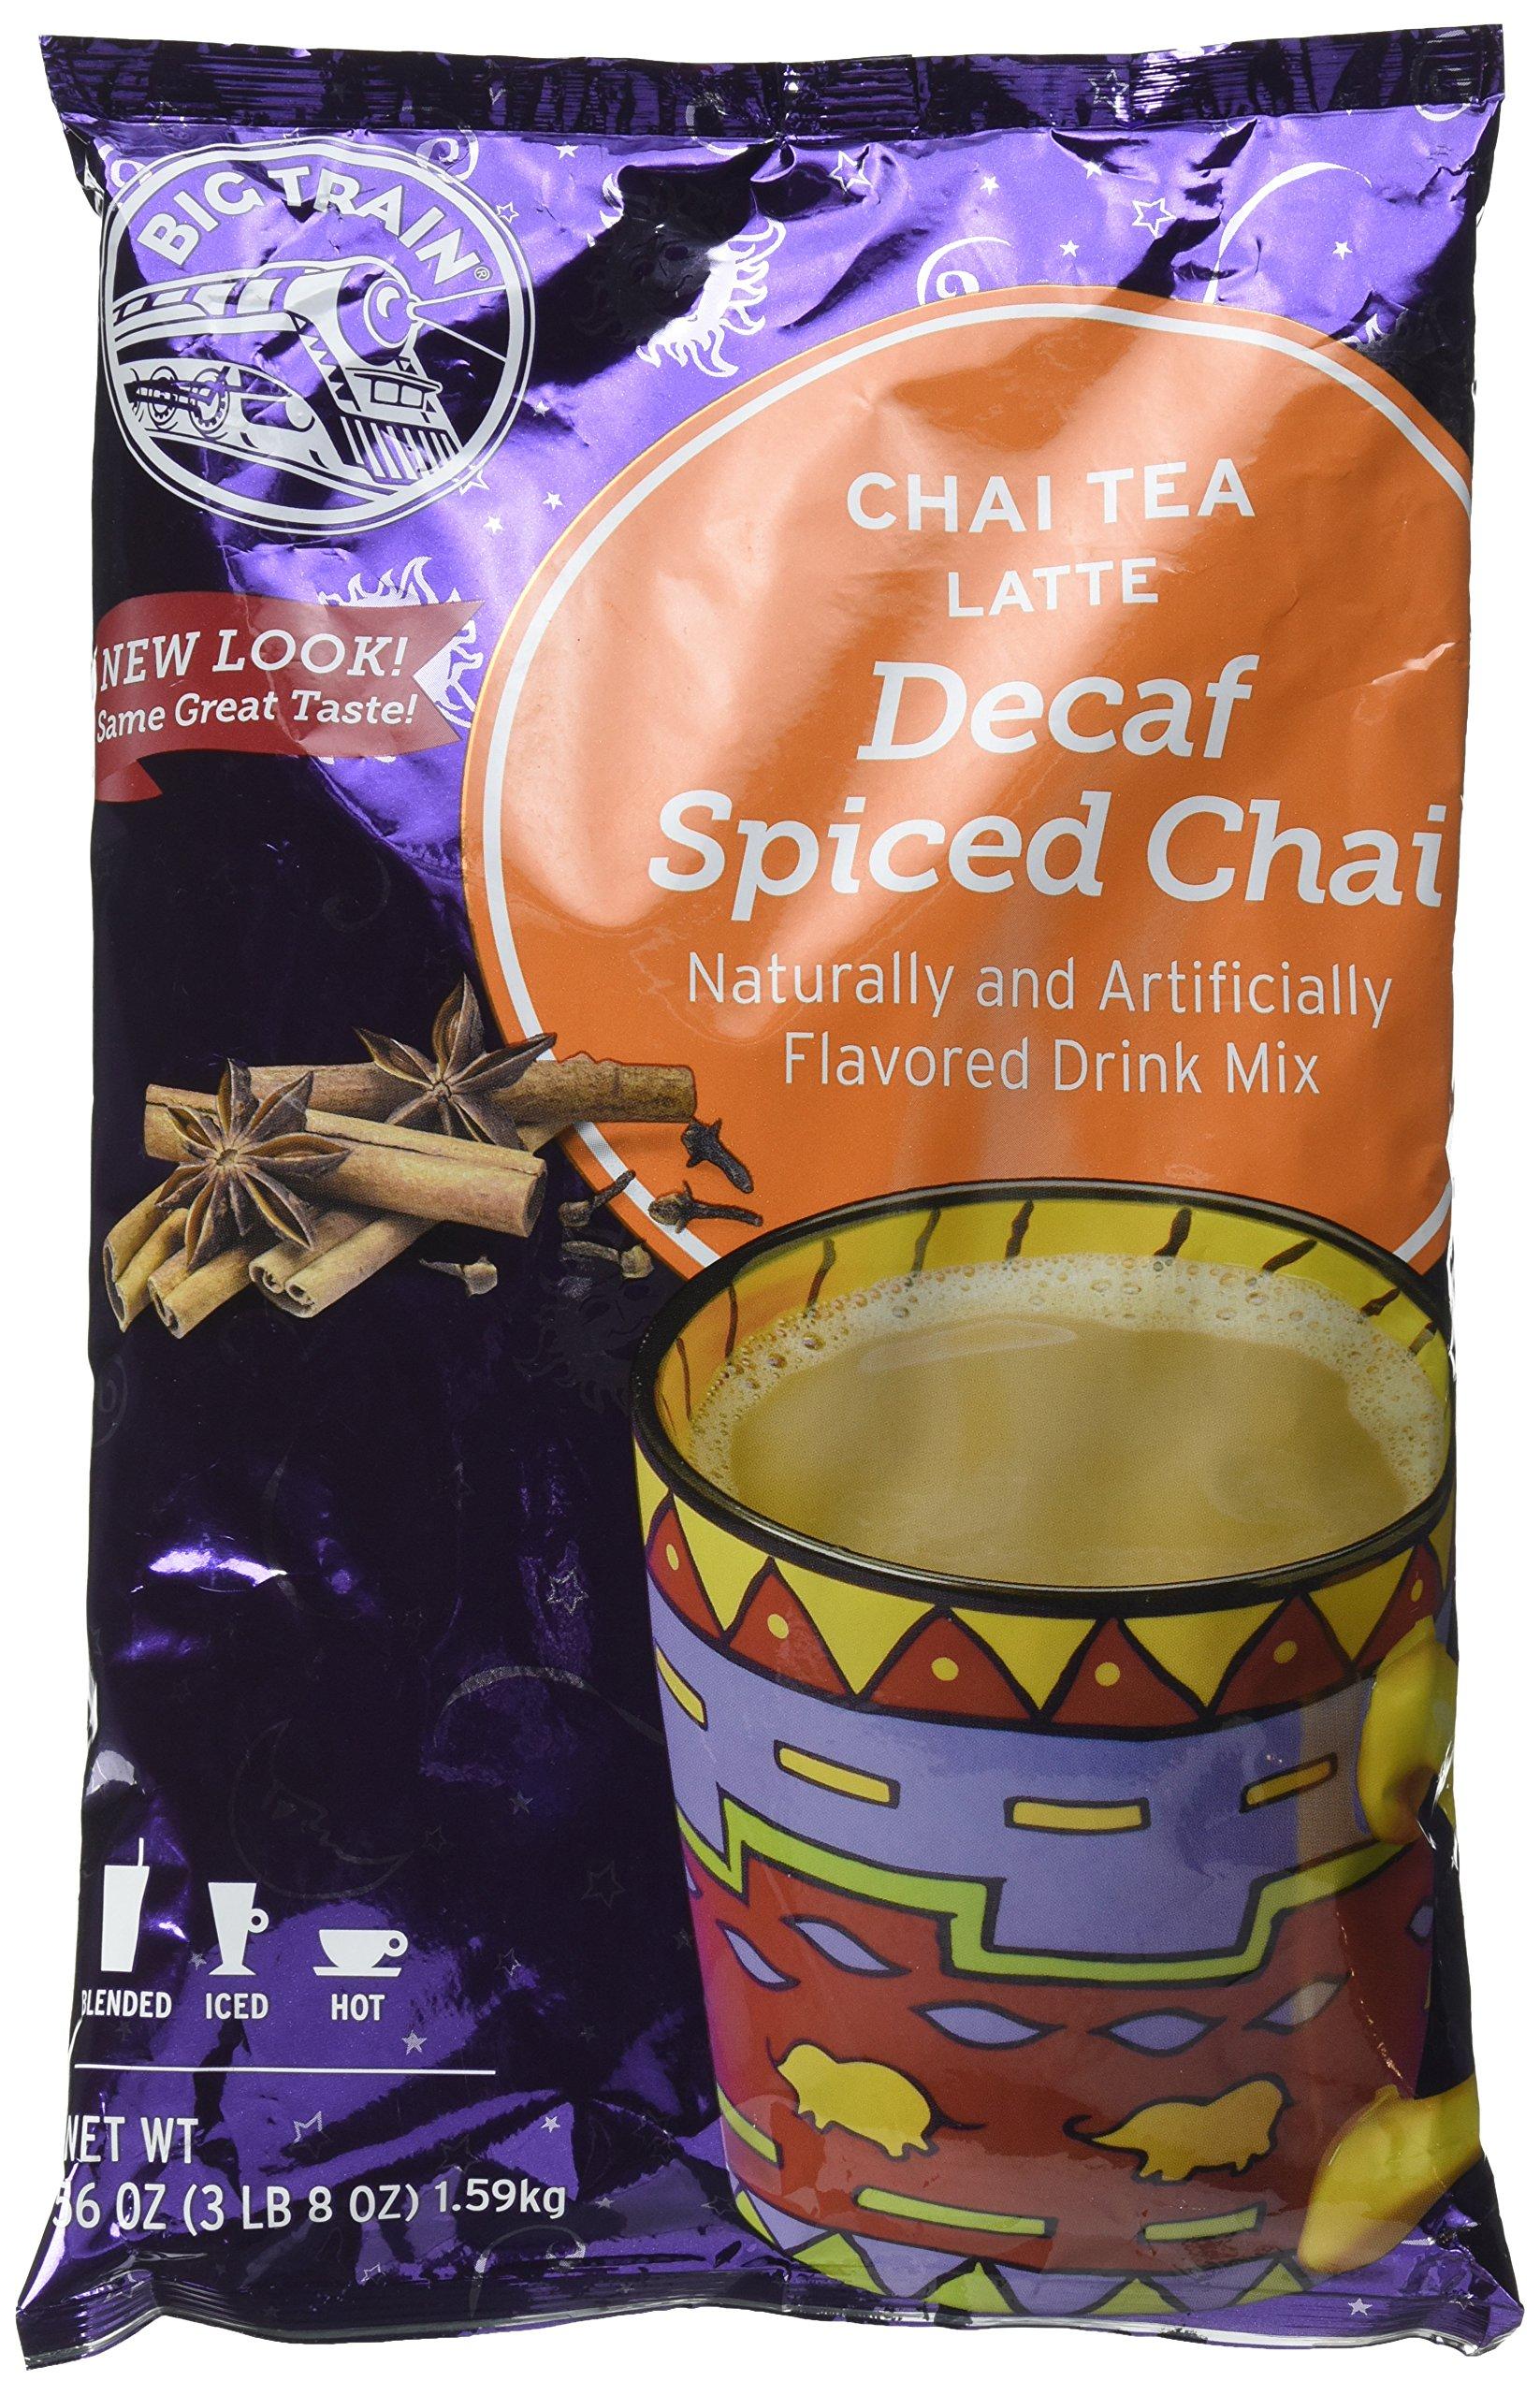 Big Train Chai - Decaf Spiced Chai, 3.5 lb Bag